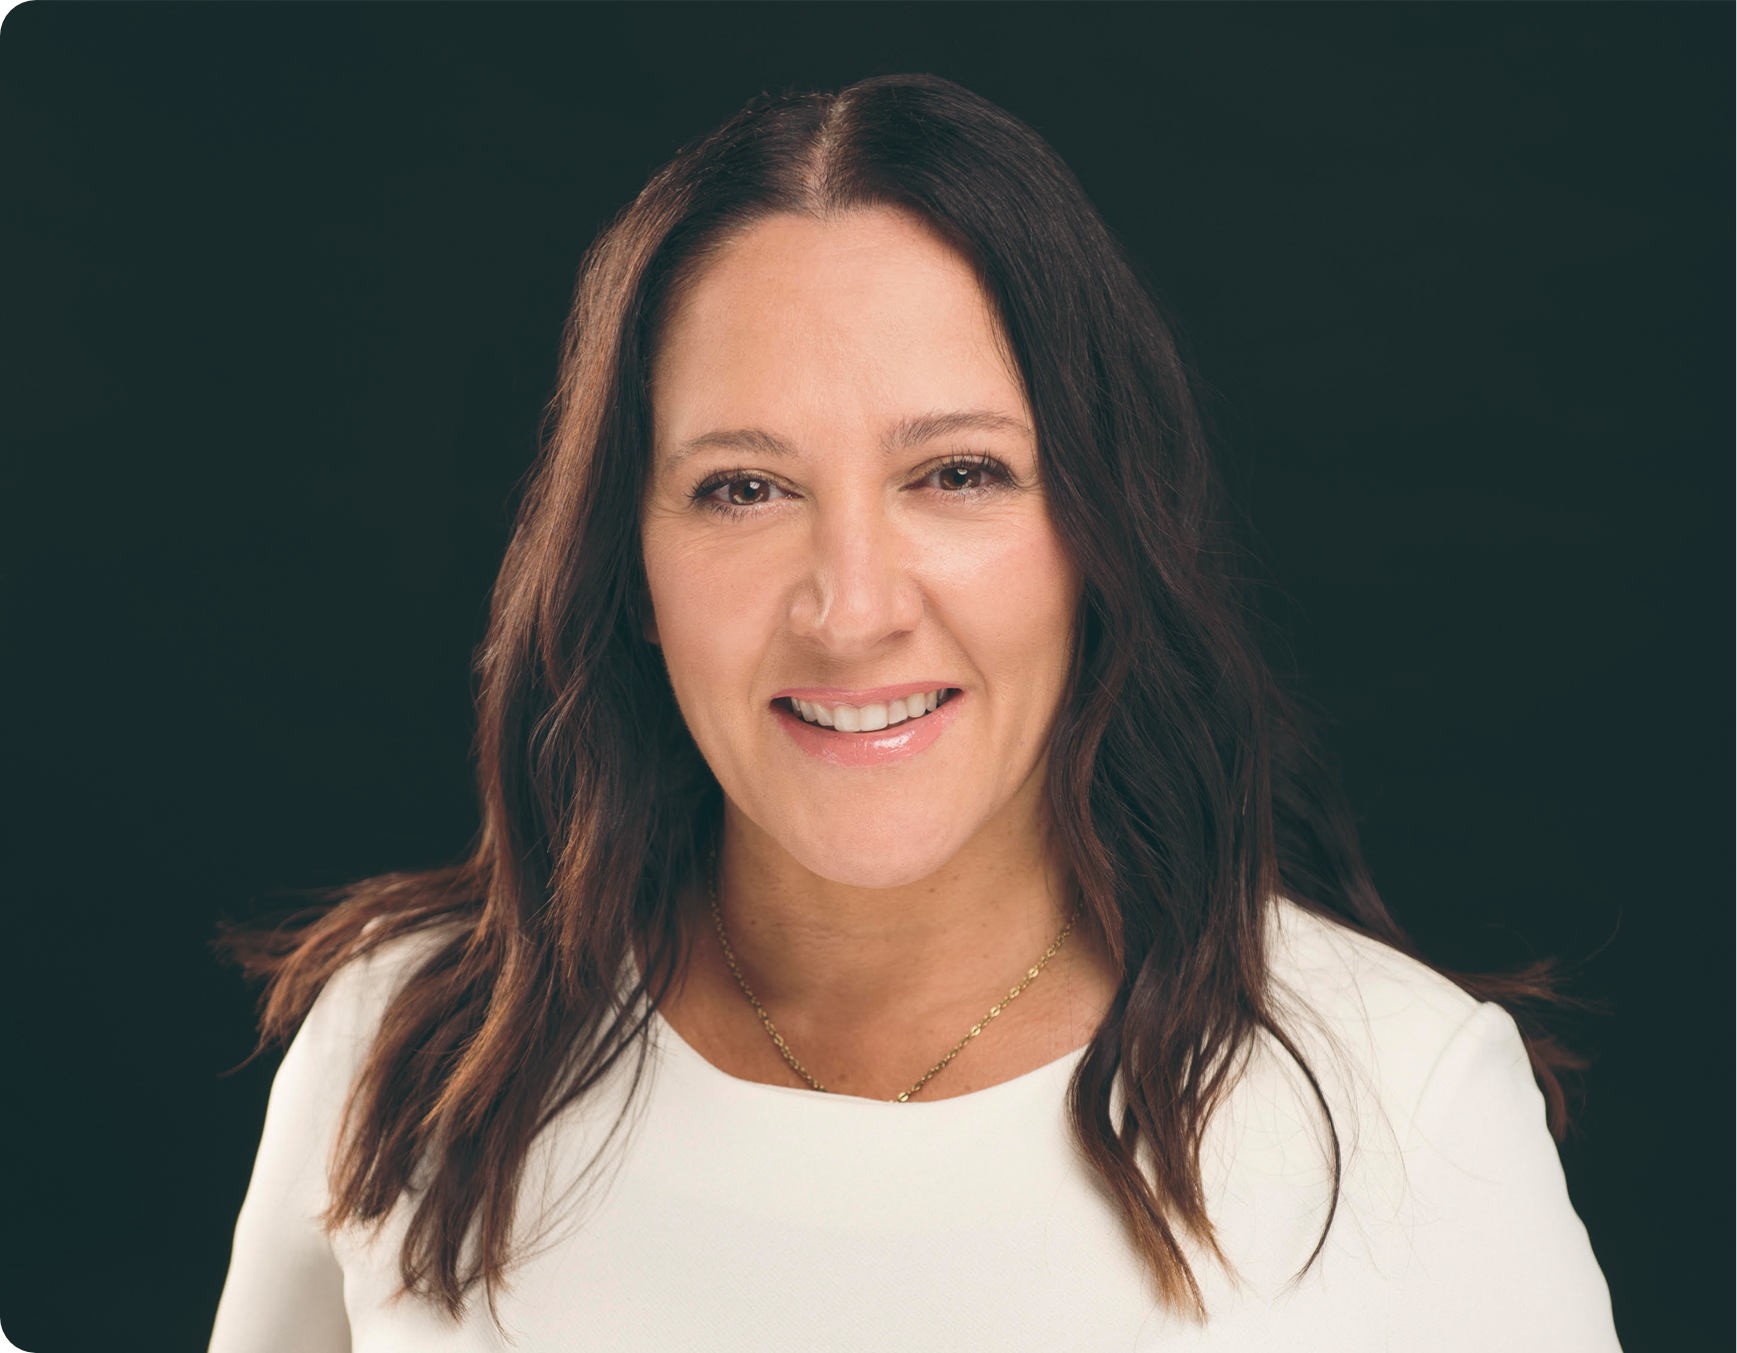 Lexop | Antoinette Noviello, VP and Corporate Controller at Videotron